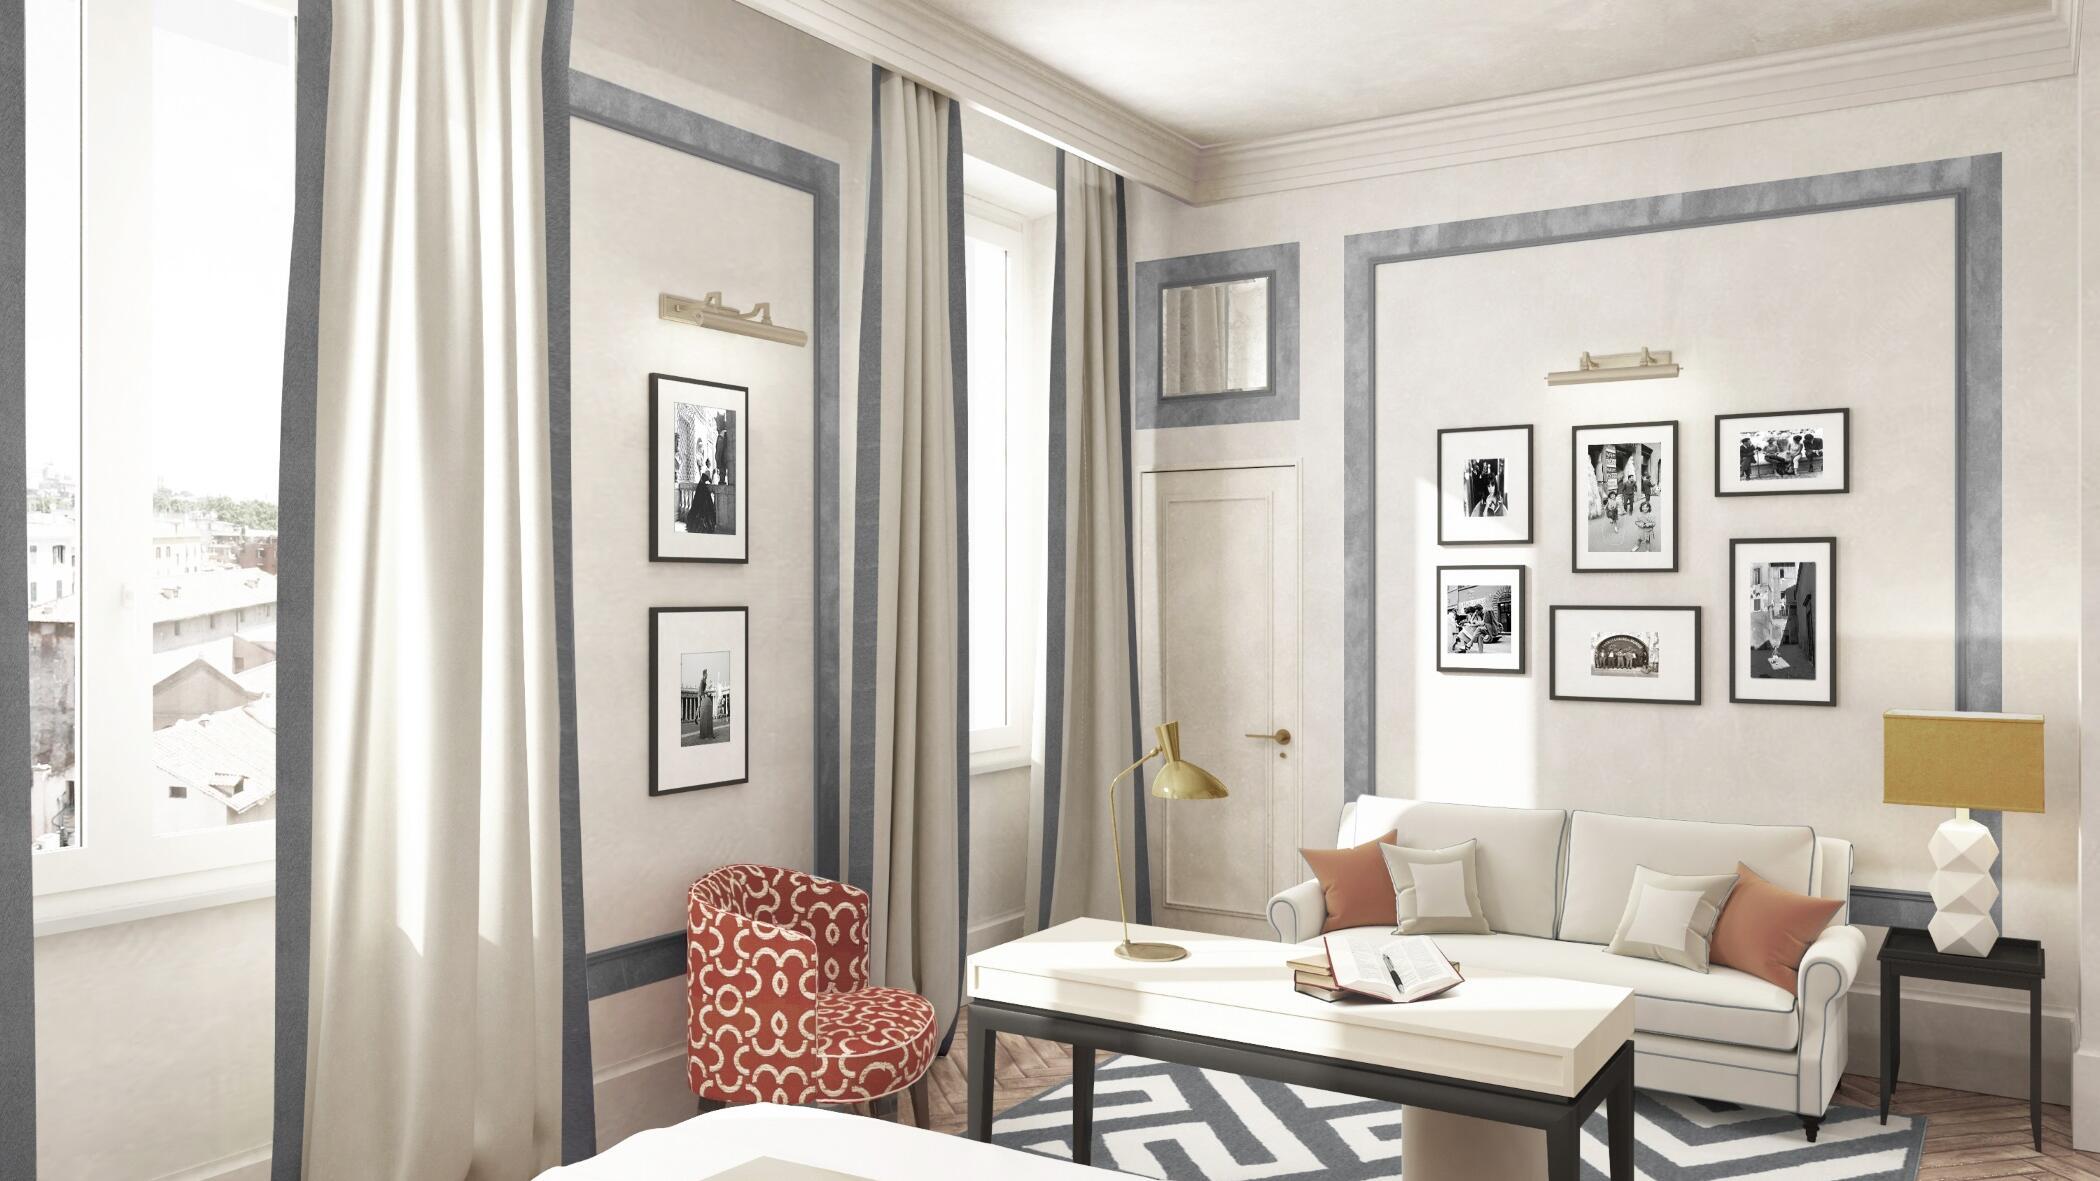 UNAHOTELS Roma Trastevere Suite